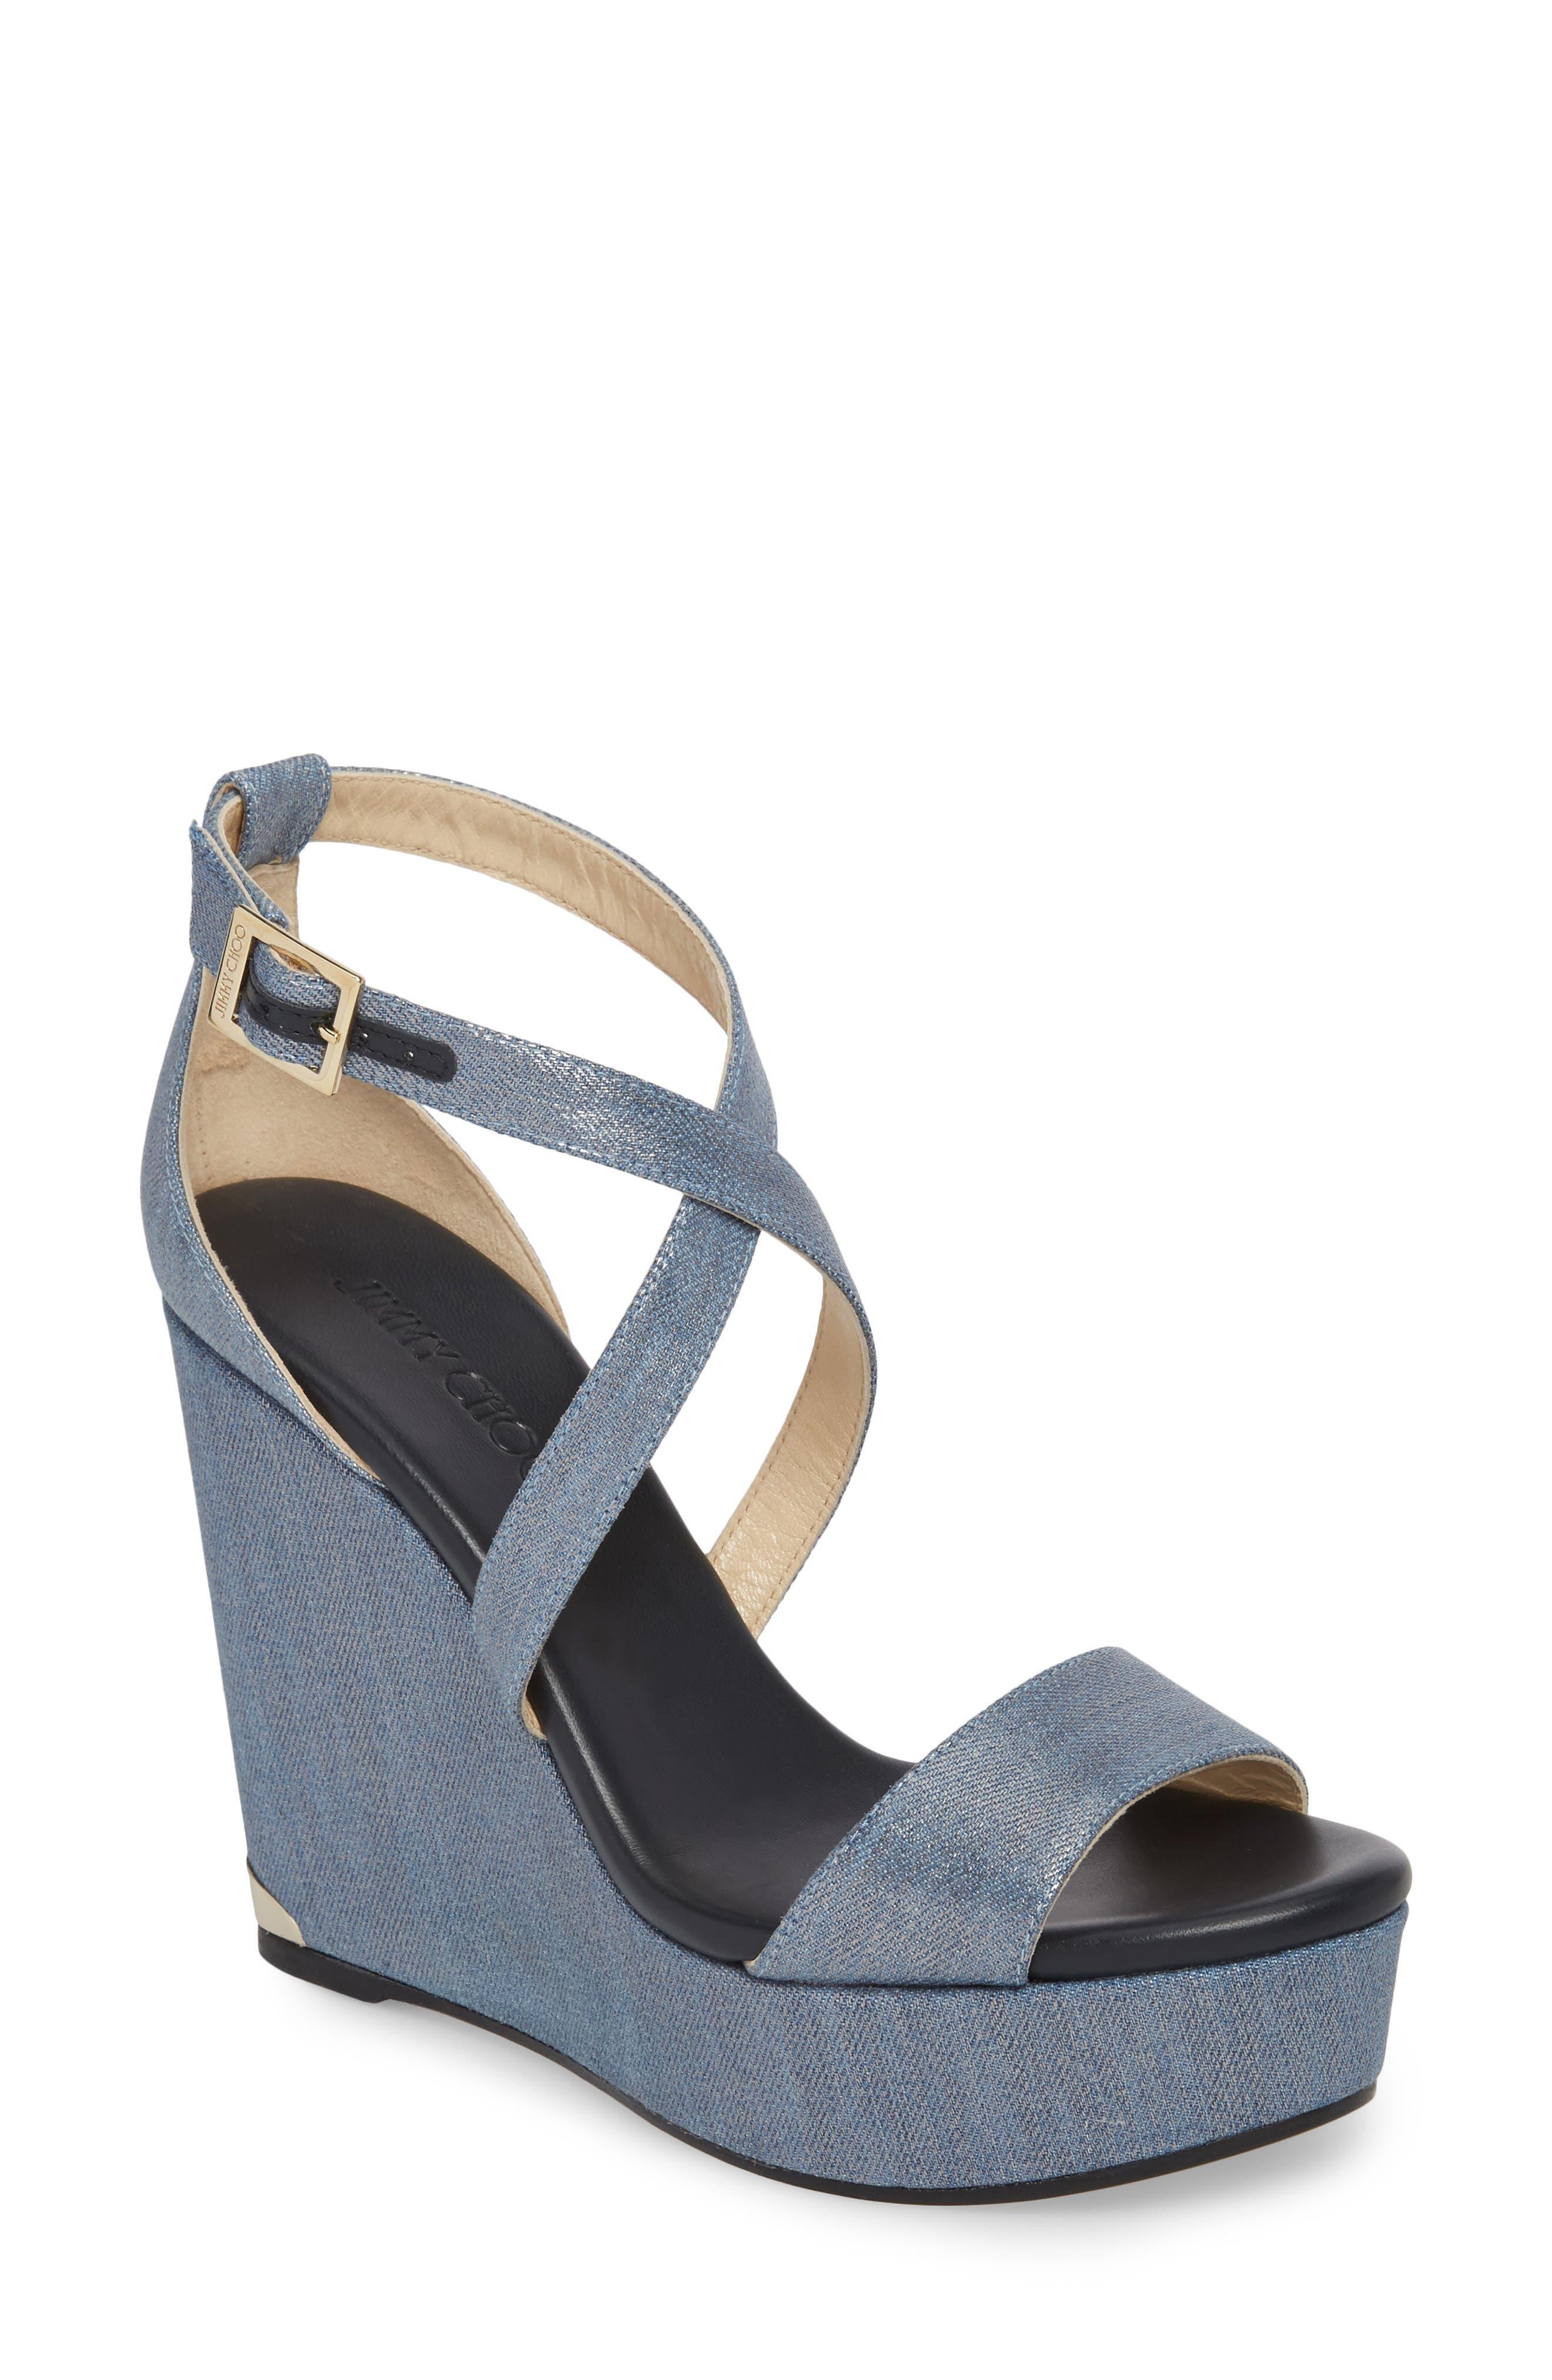 Portia Platform Wedge Sandal,                         Main,                         color, Dusk Blue